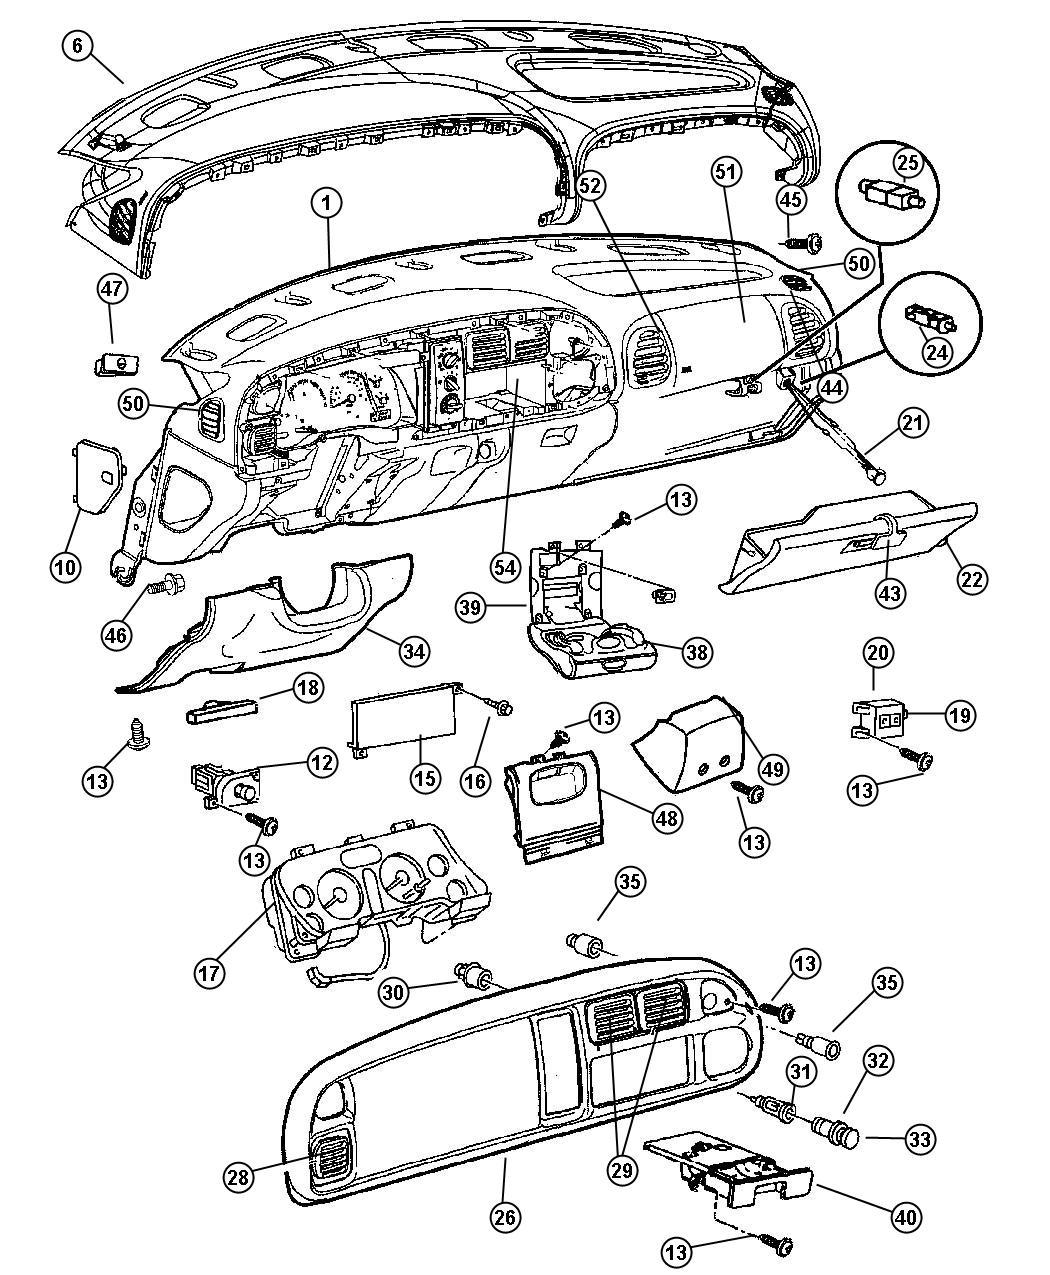 1999 Dodge Ram 2500 Door. Fuse acess. [az], agate. Trim